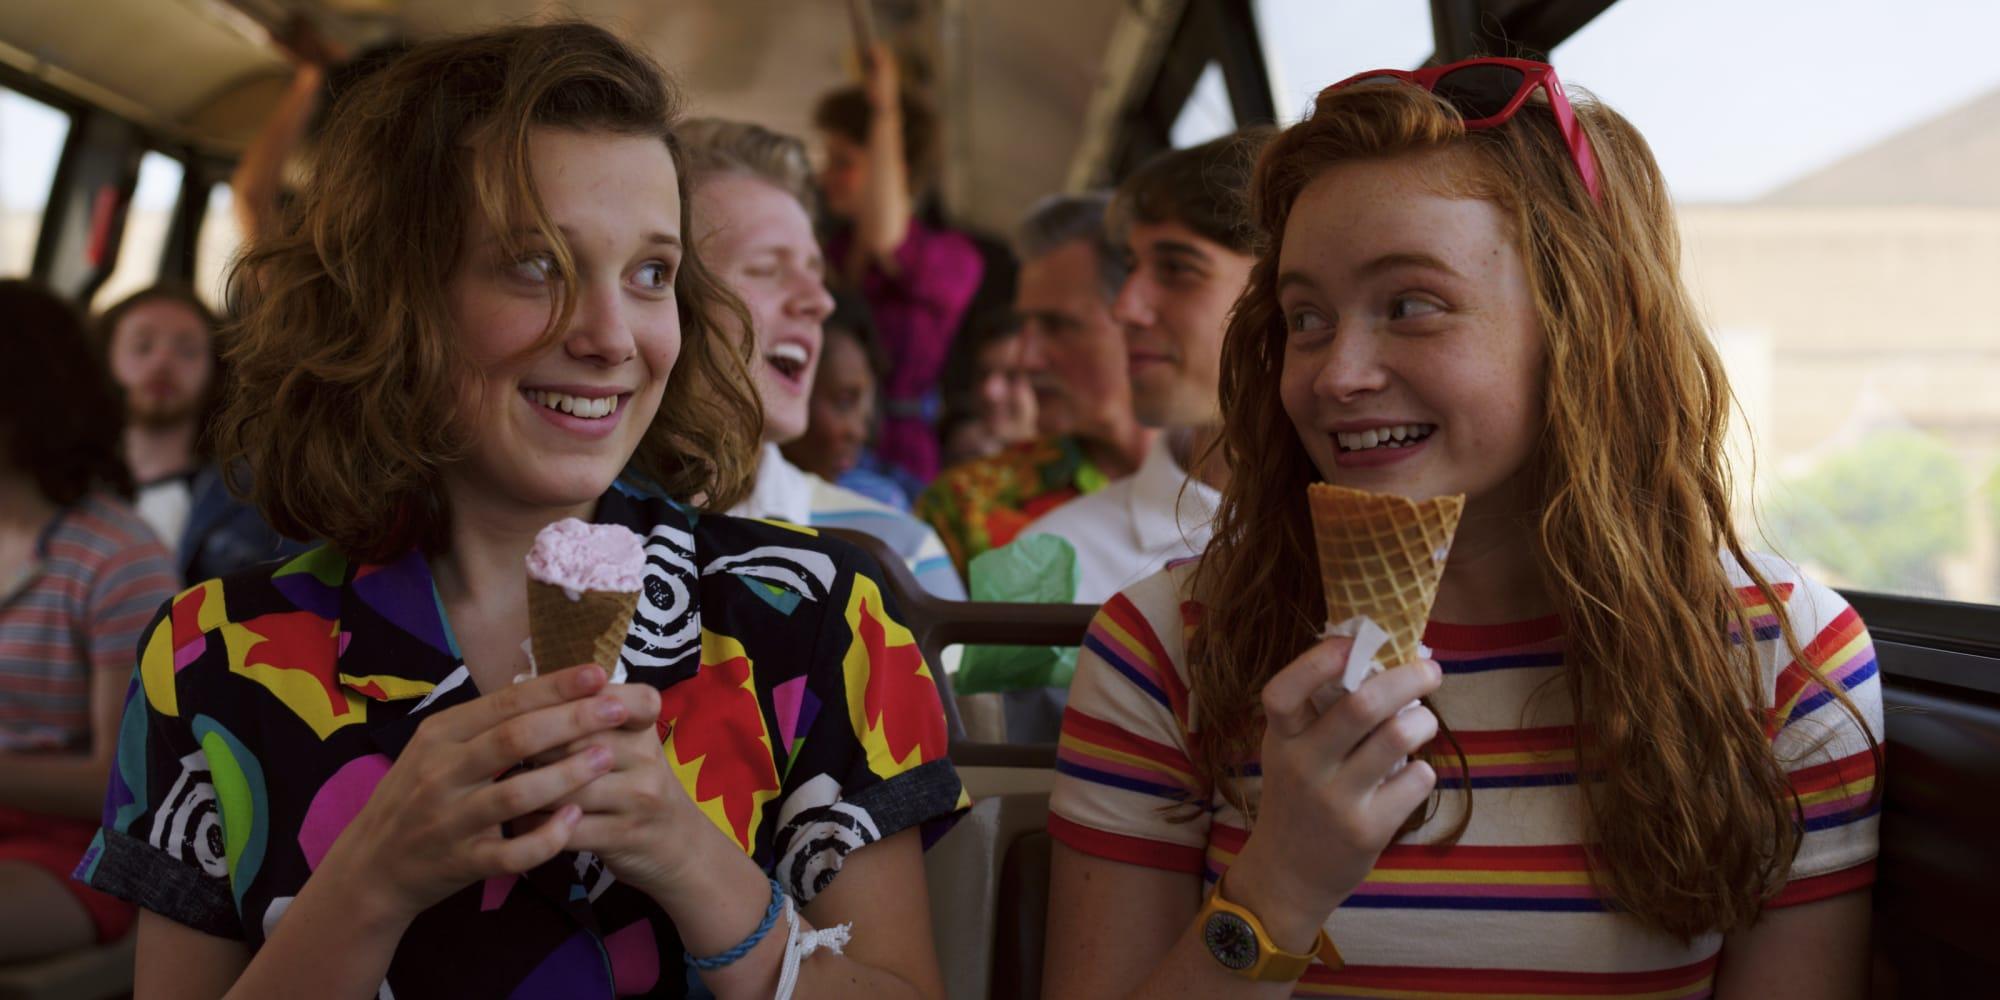 Stranger Things season 4 was supposed resume filming this week